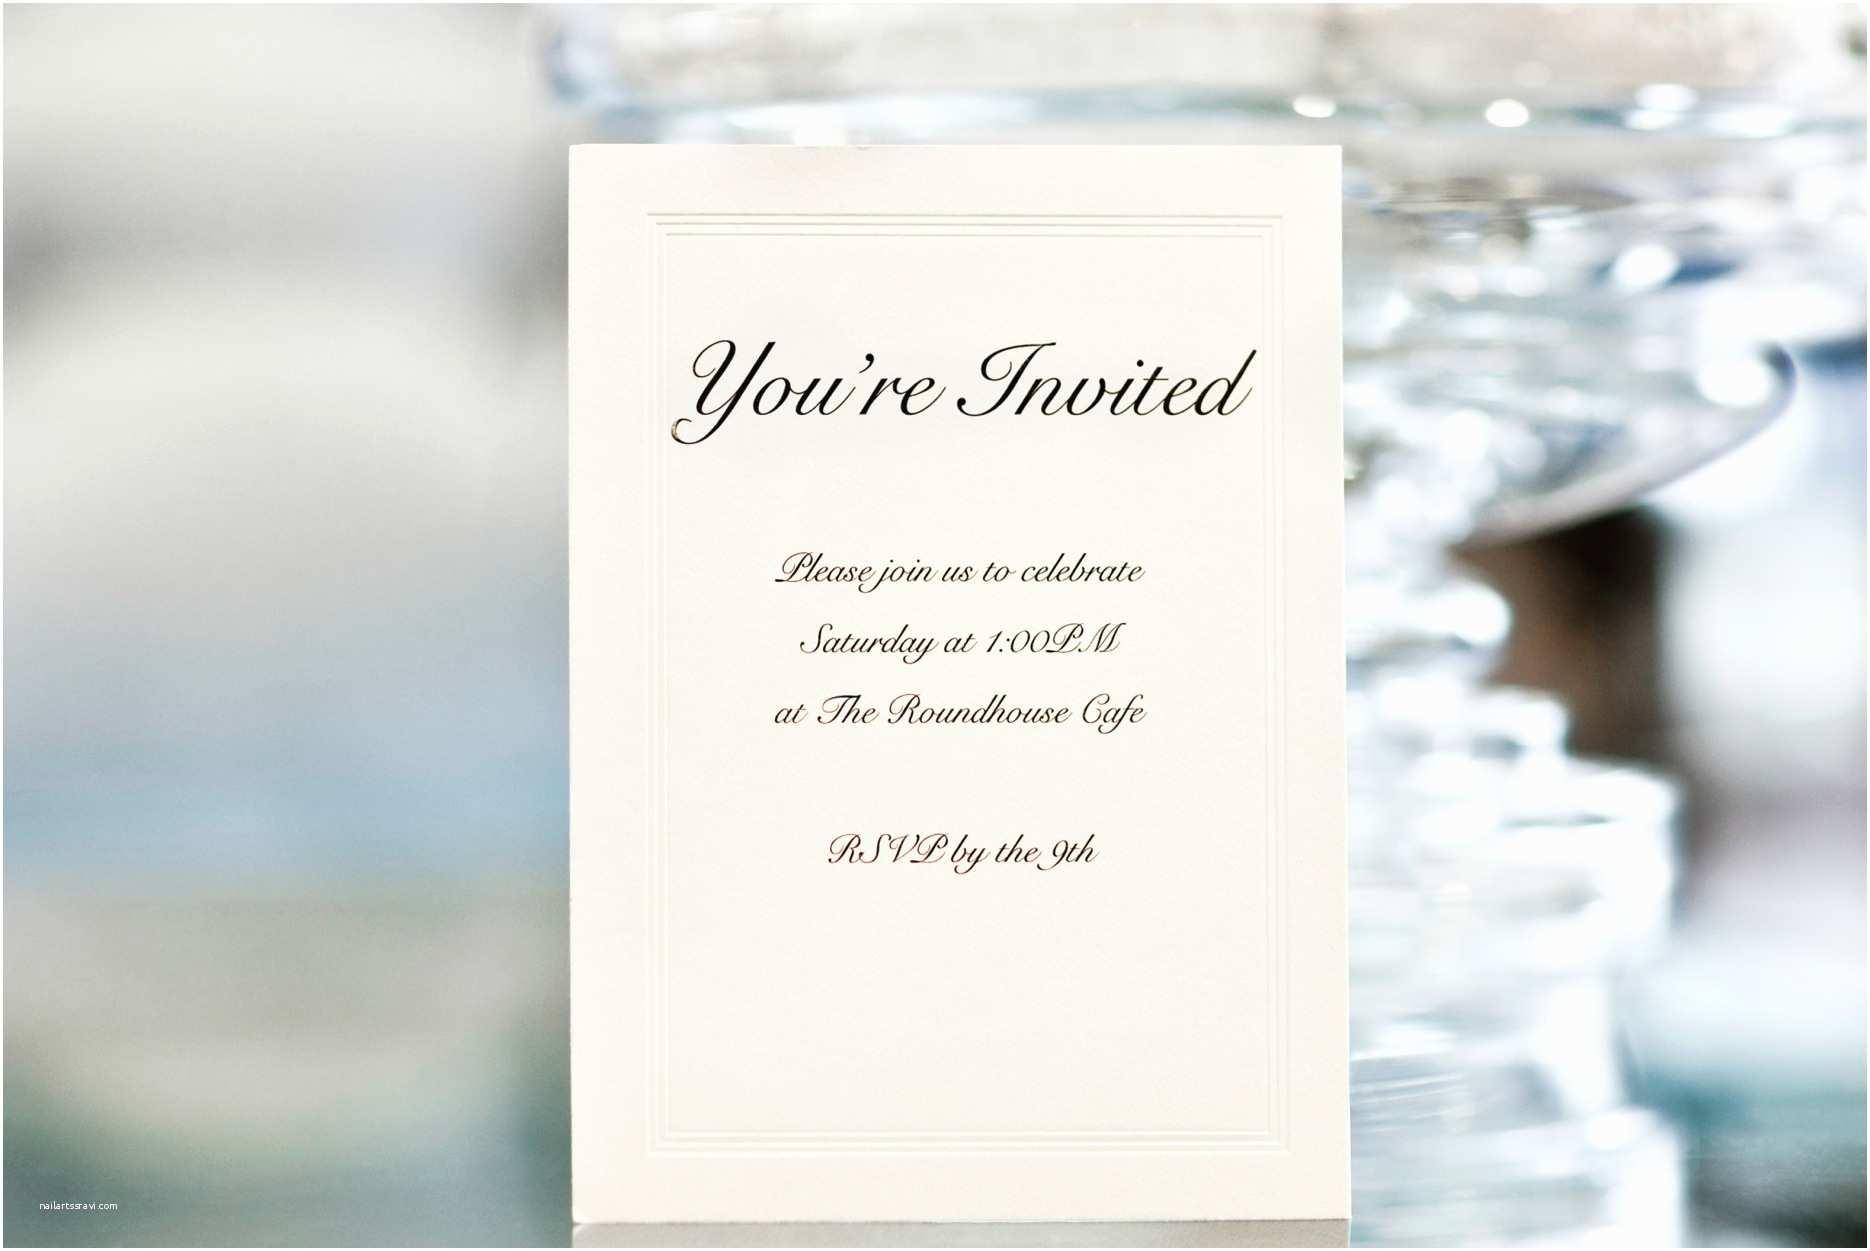 Wedding Invitation Wording Ideas Ideas for Wedding Invitation Wording